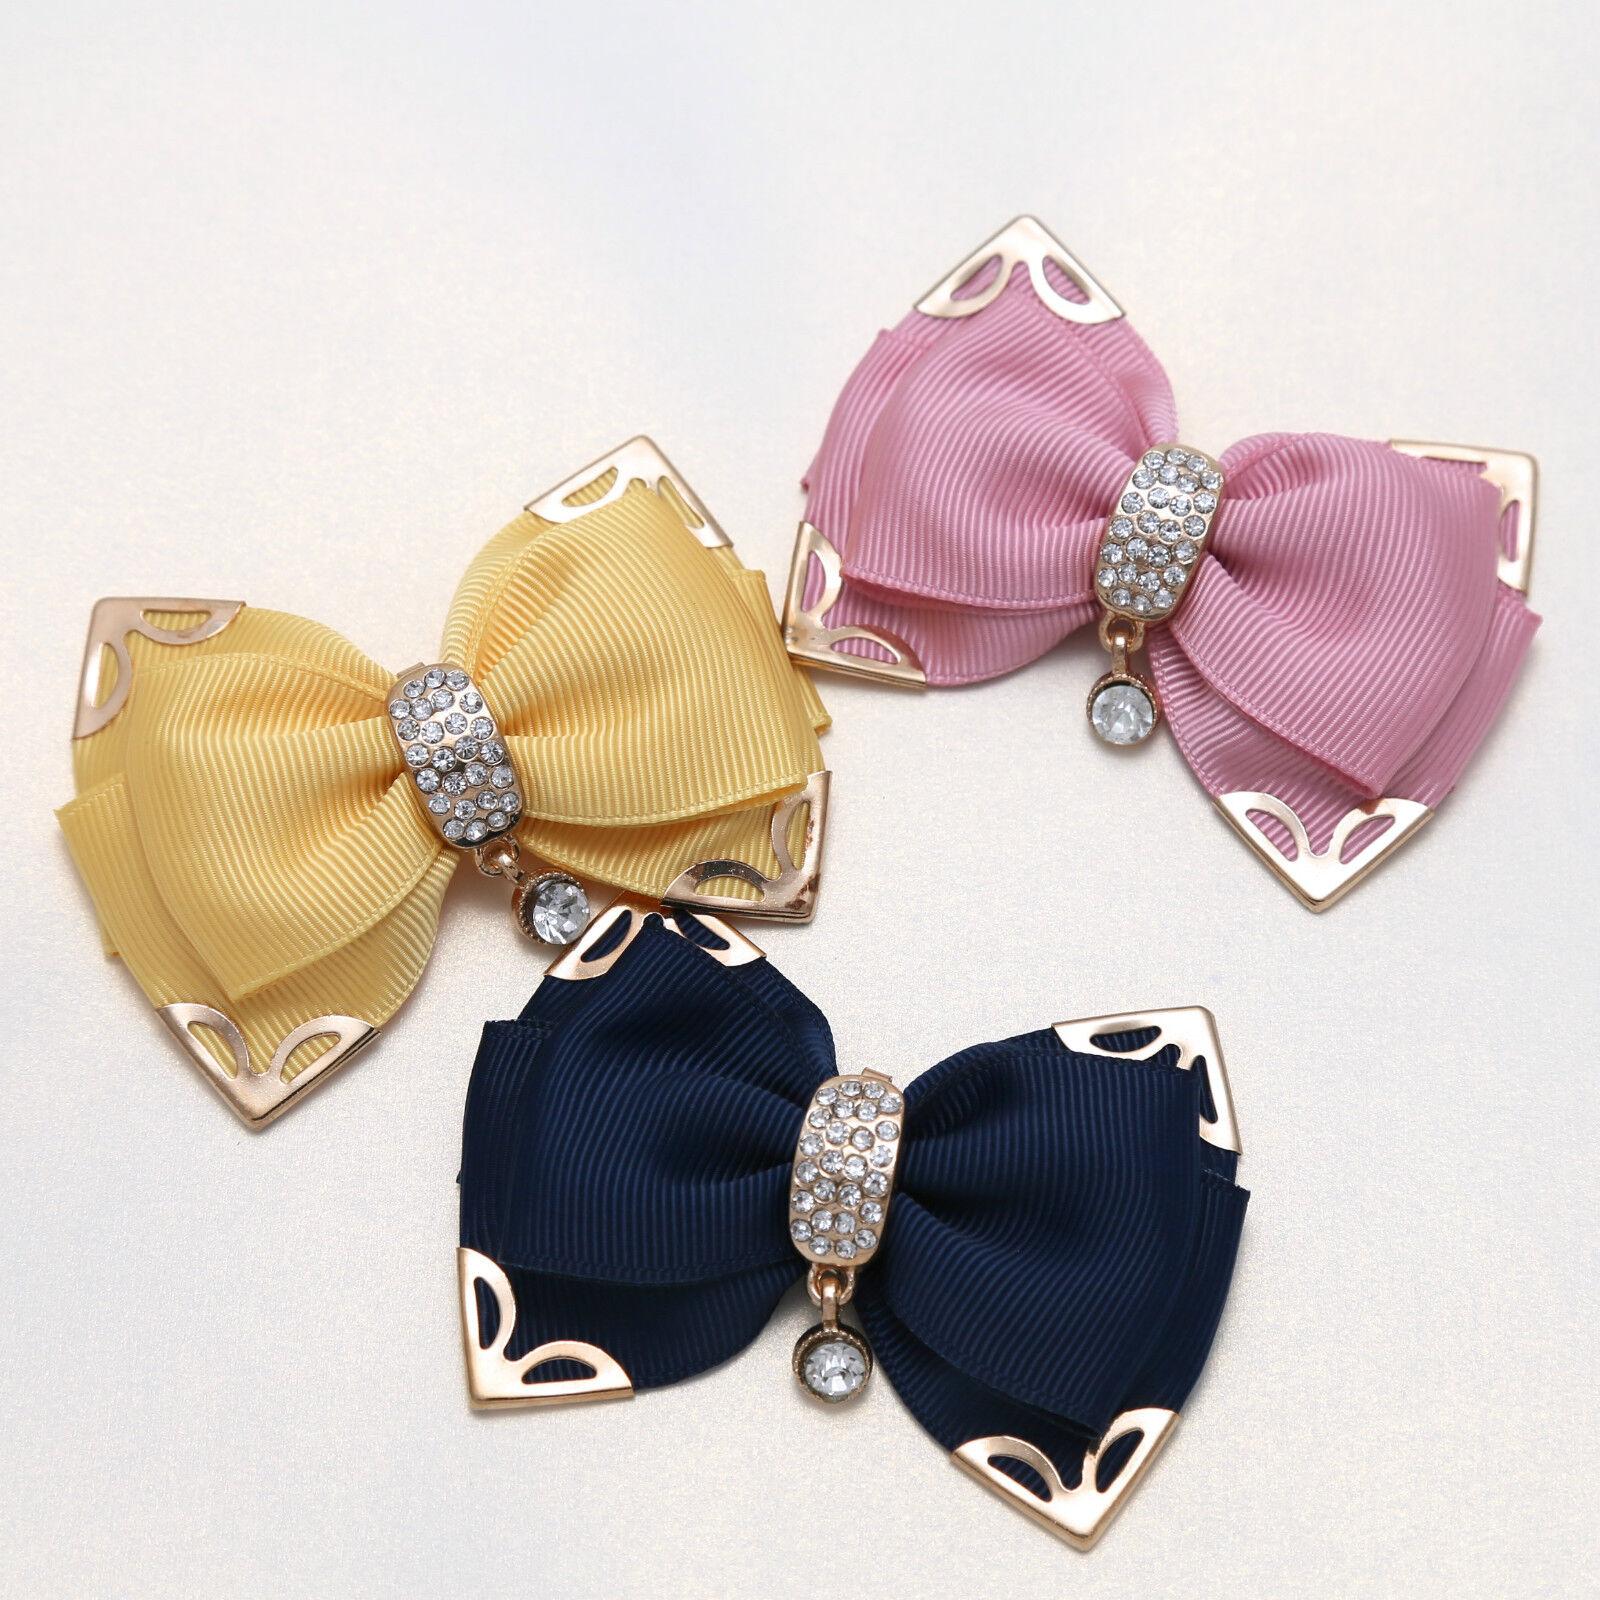 2Pcs Diamante Crystal Color Bow Shoes Shoe Clips Charms